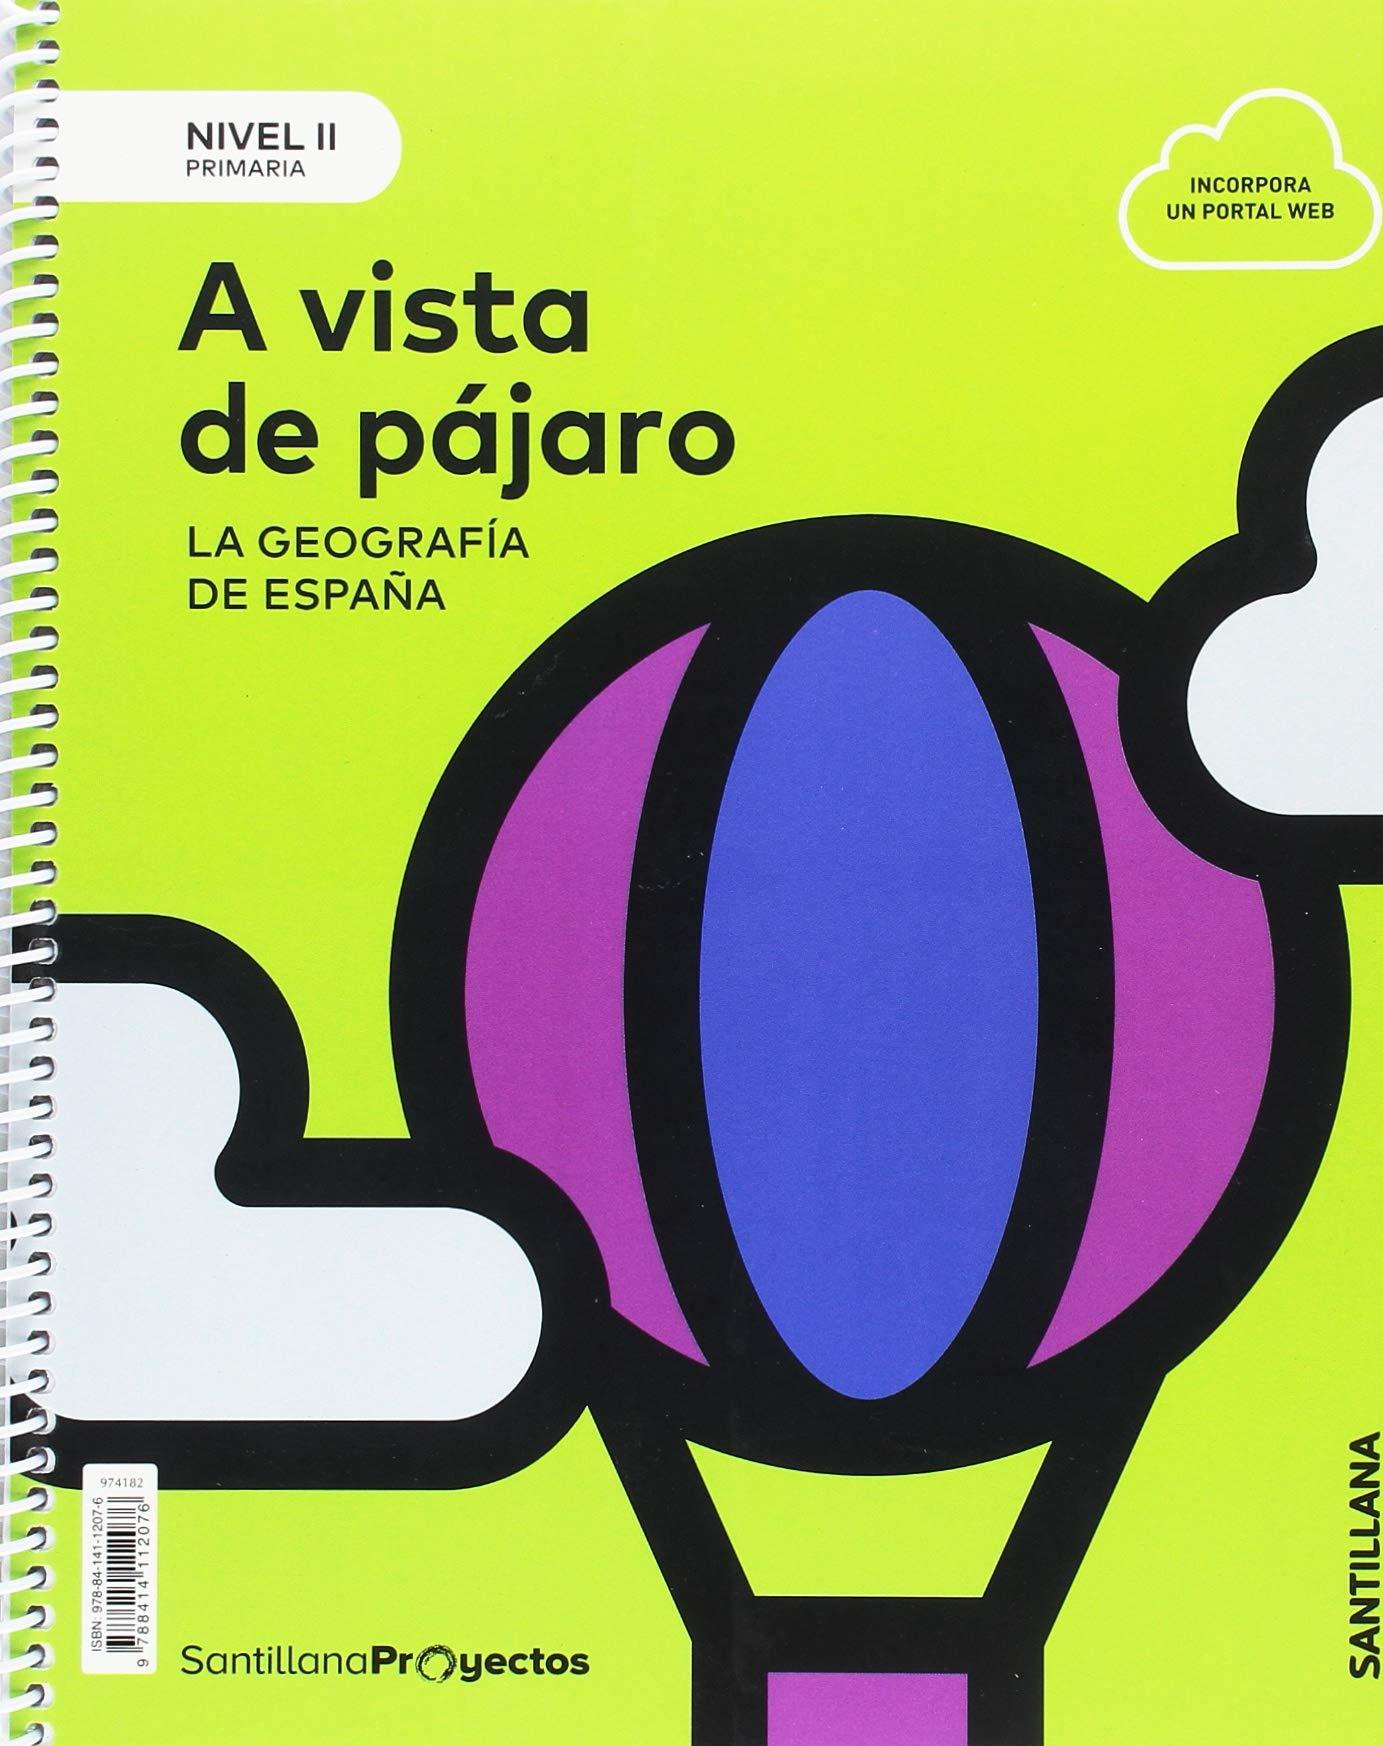 NIVEL II PRI A VISTA DE PAJARO. LA GEOGRAFIA DE ESPAÑA: Amazon.es: Libros